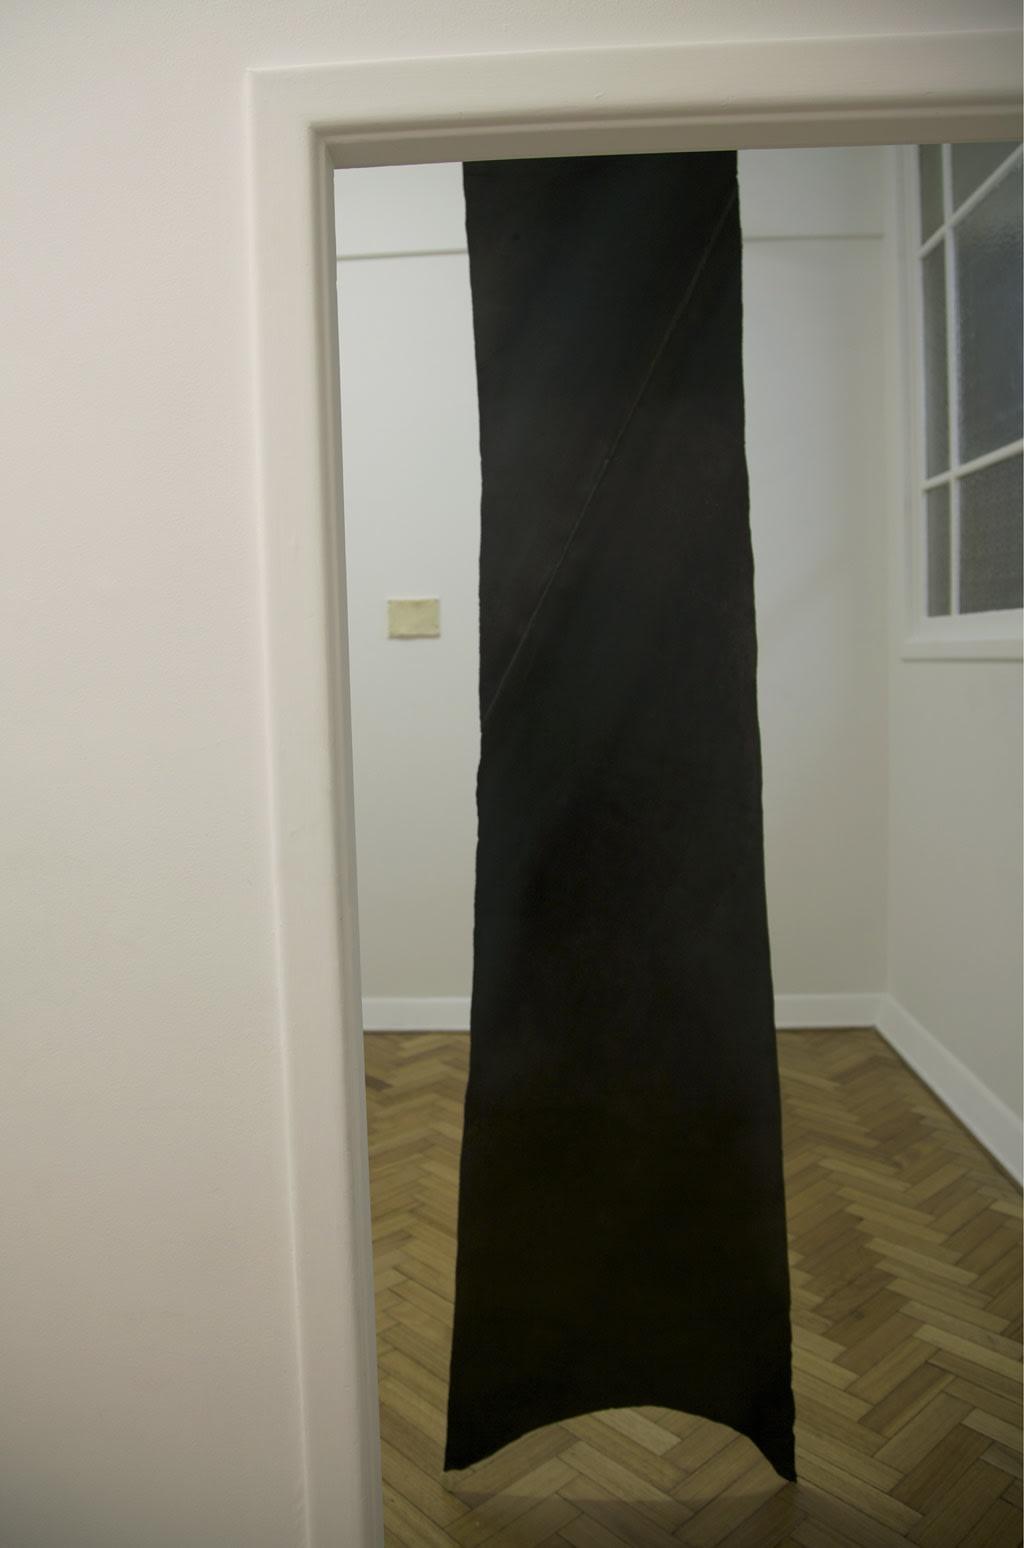 Susan Jacobs, Yield (oxhide), 2014